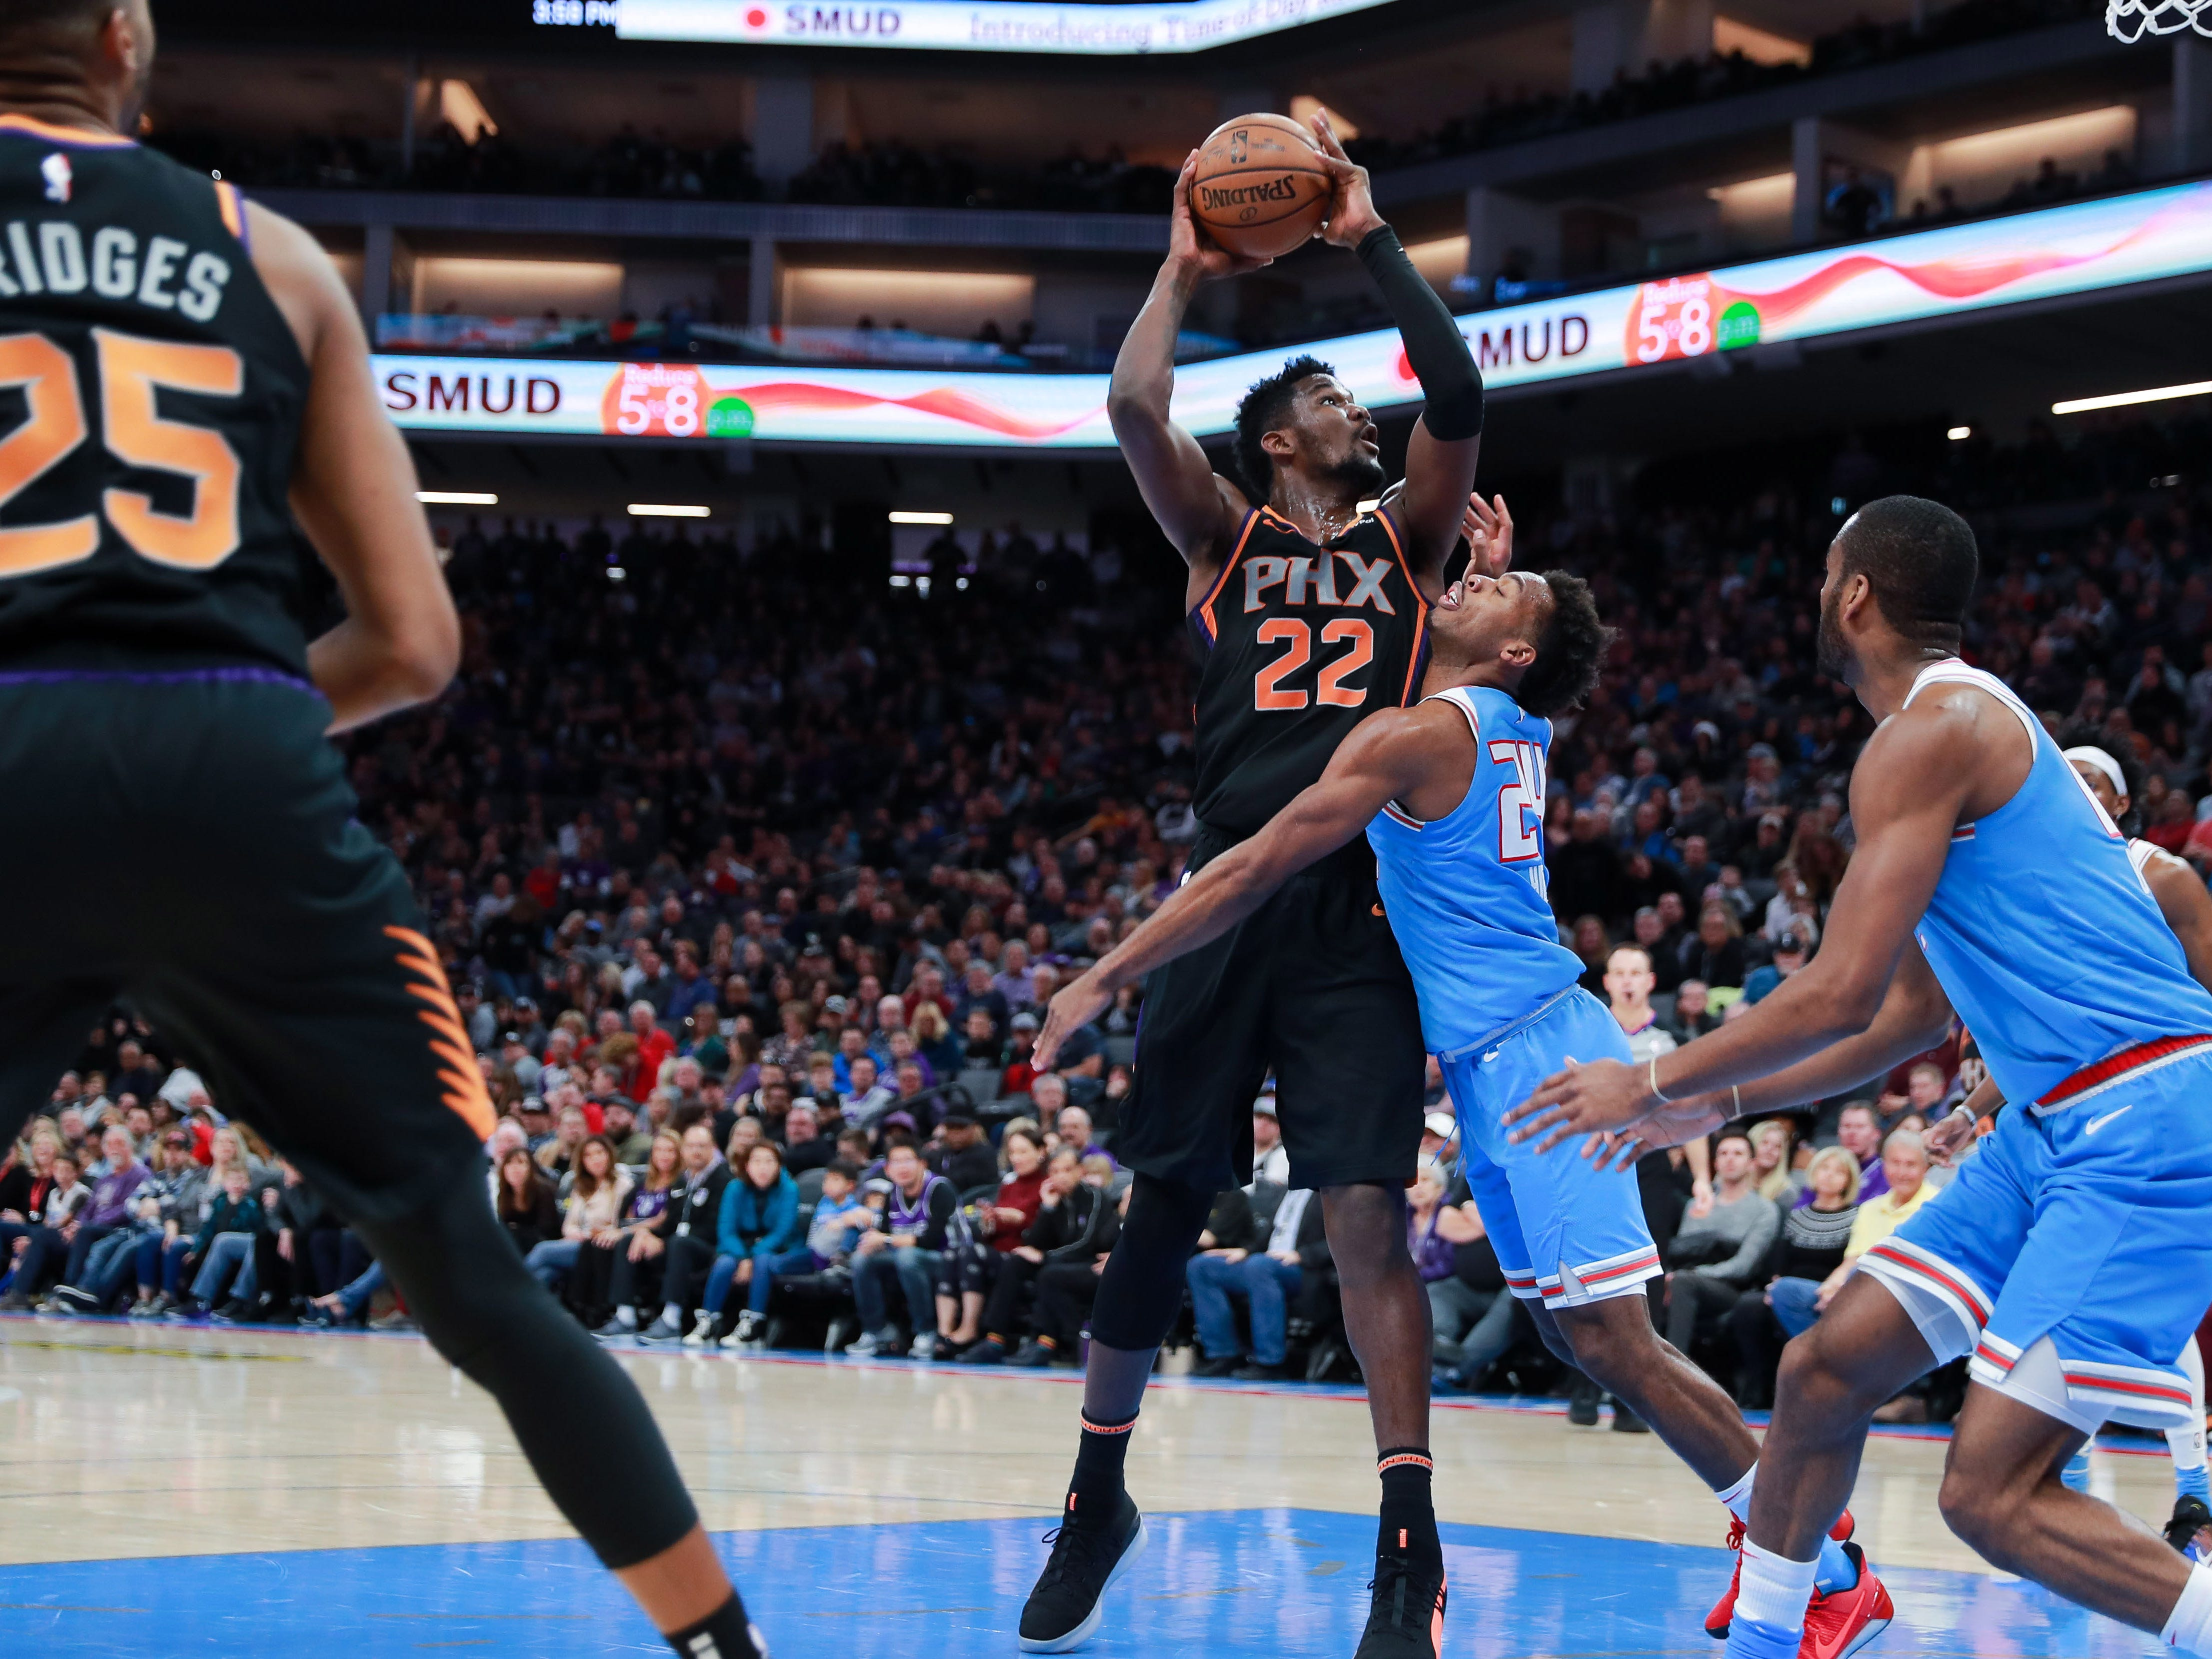 Feb 10, 2019; Sacramento, CA, USA; Phoenix Suns center Deandre Ayton (22) shoots the ball over Sacramento Kings guard Buddy Hield (24) during the second quarter at Golden 1 Center.